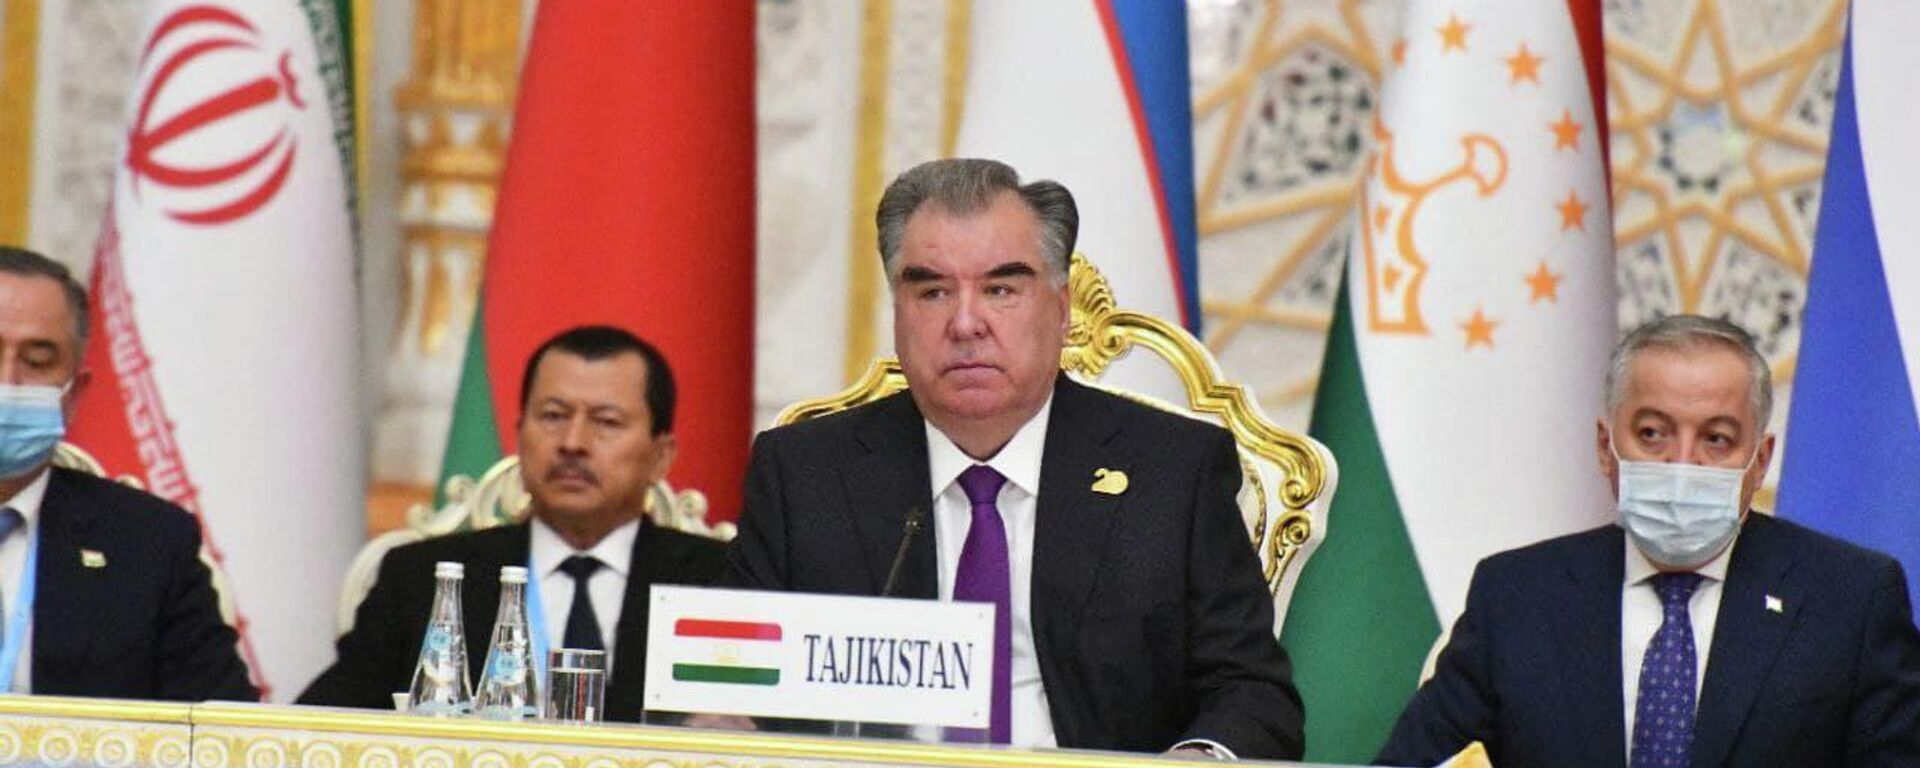 Президент Республики Таджикистан Эмомали Рахмон - Sputnik Тоҷикистон, 1920, 17.09.2021